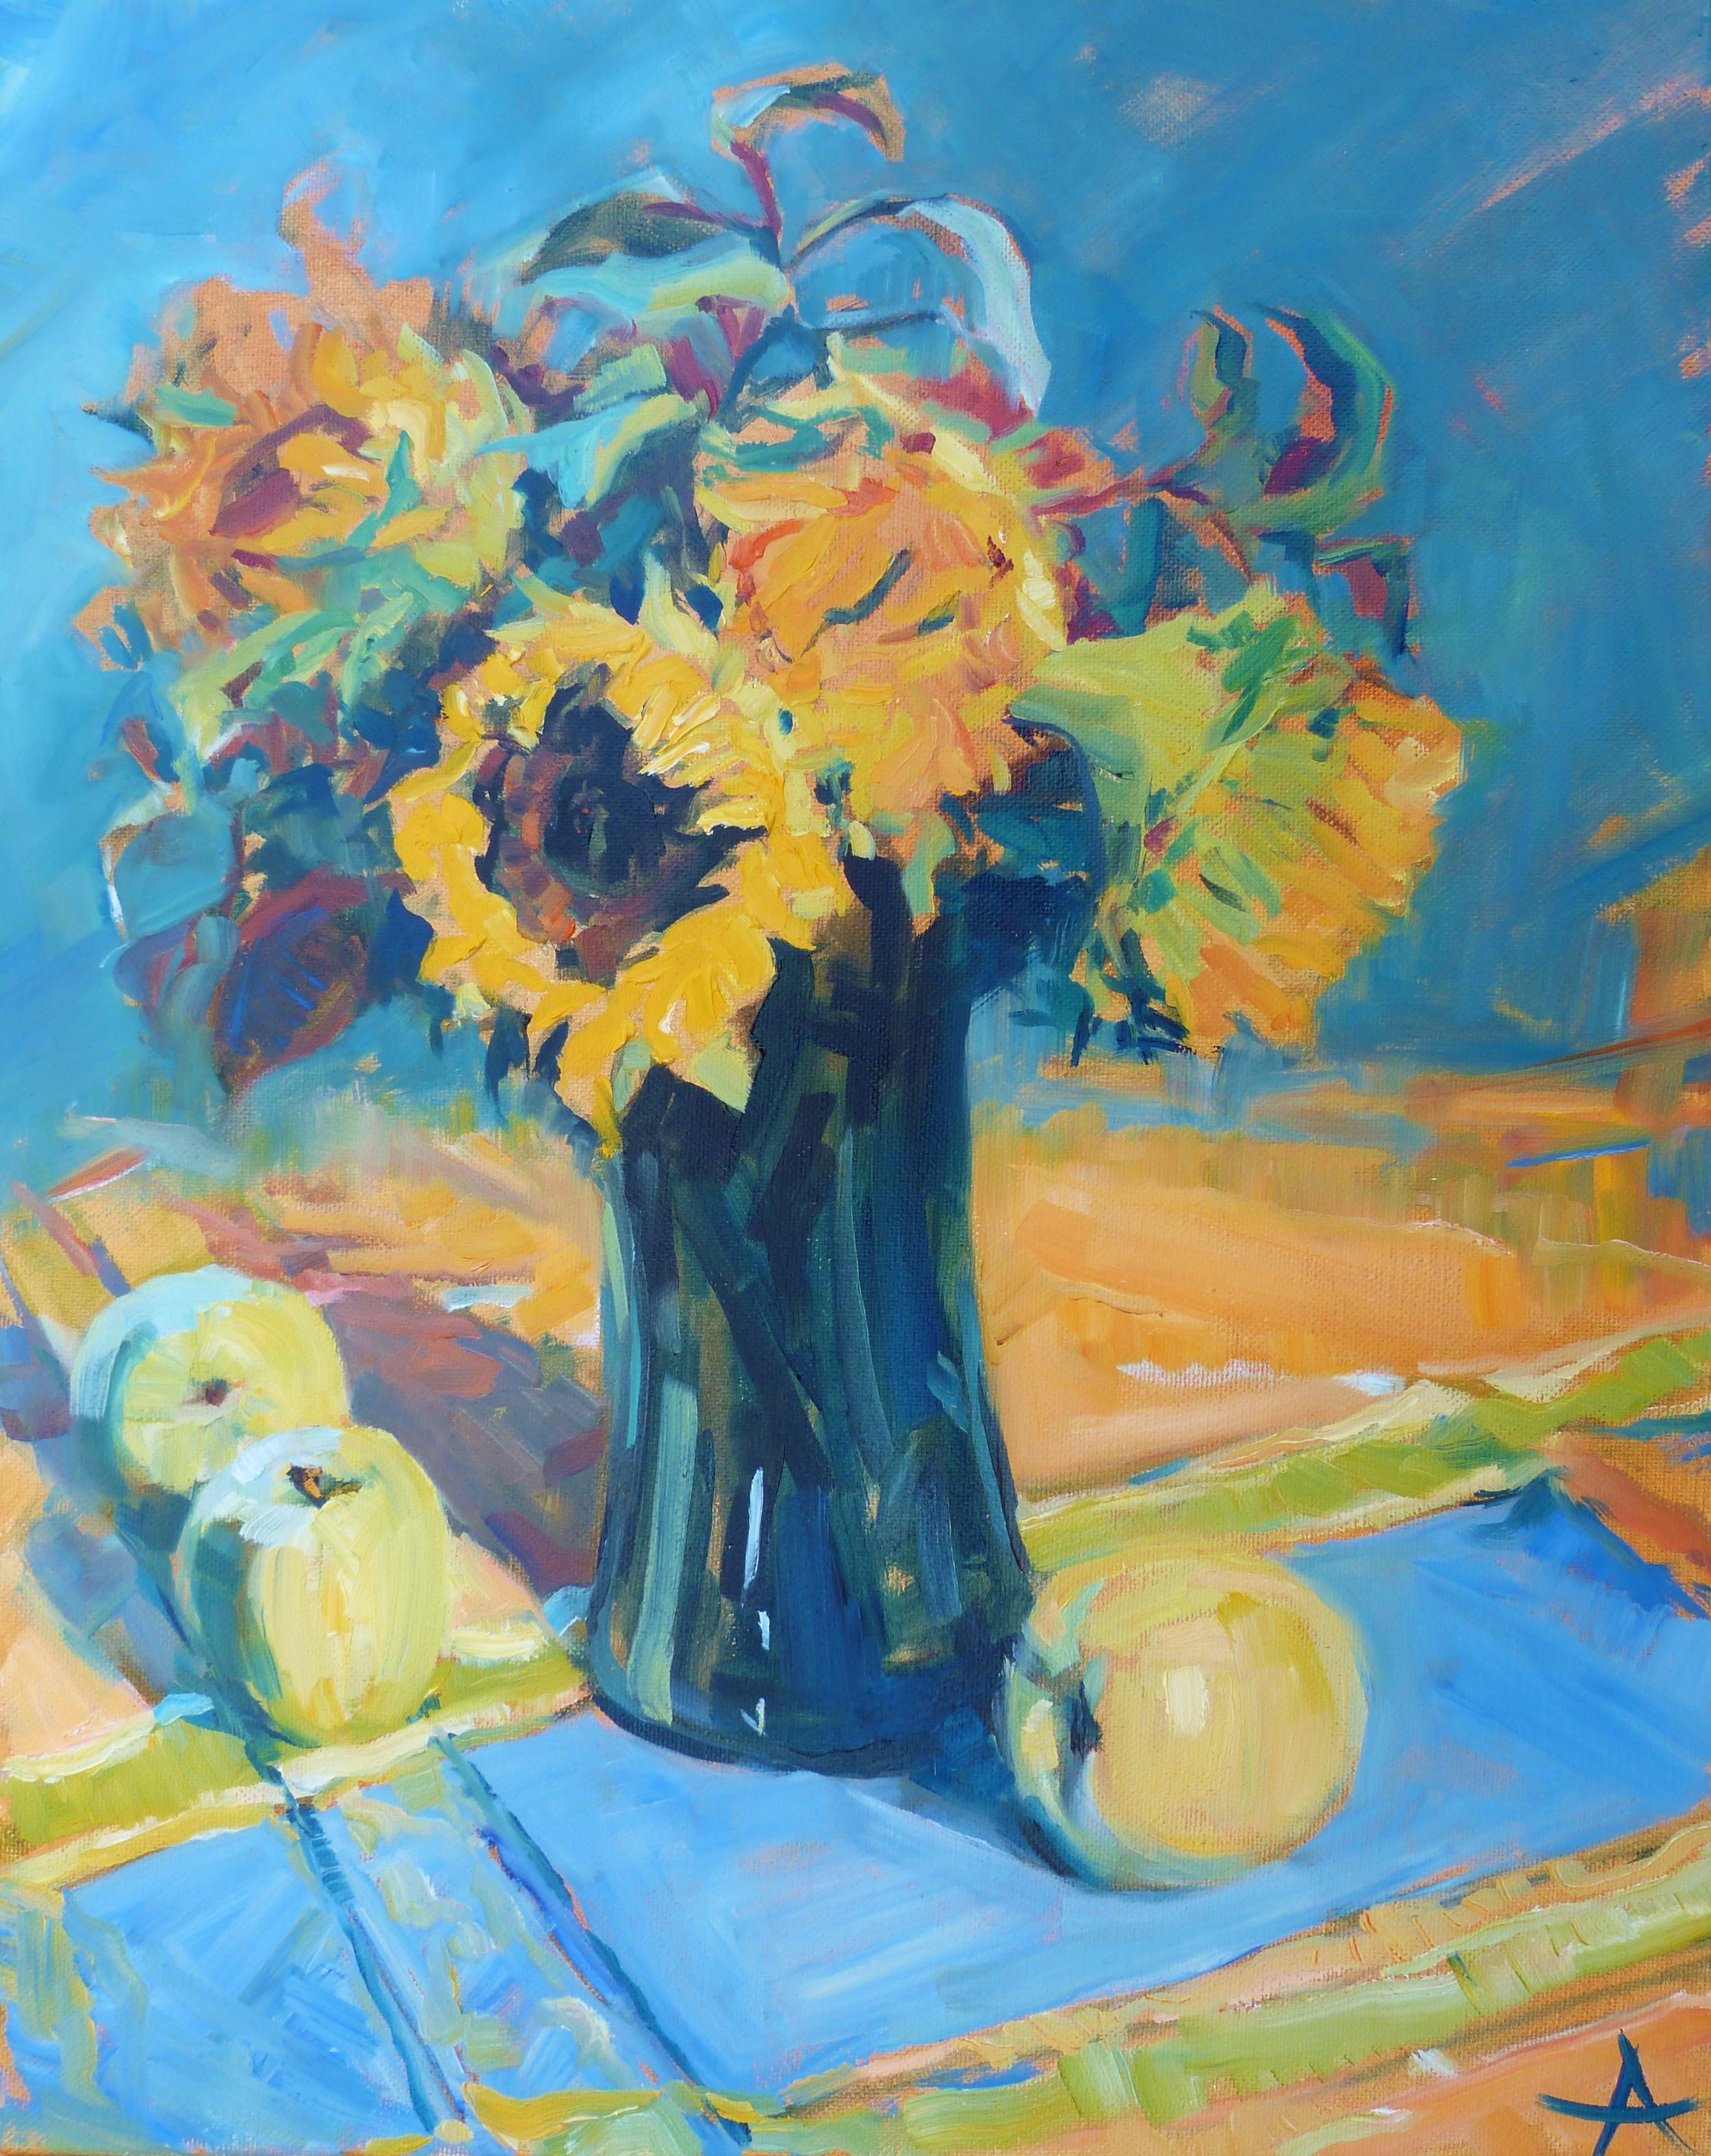 "SOLD, Sunflowers, Copyright 2014 Hirschten, Oil on Canvas, 16"" x 20"""